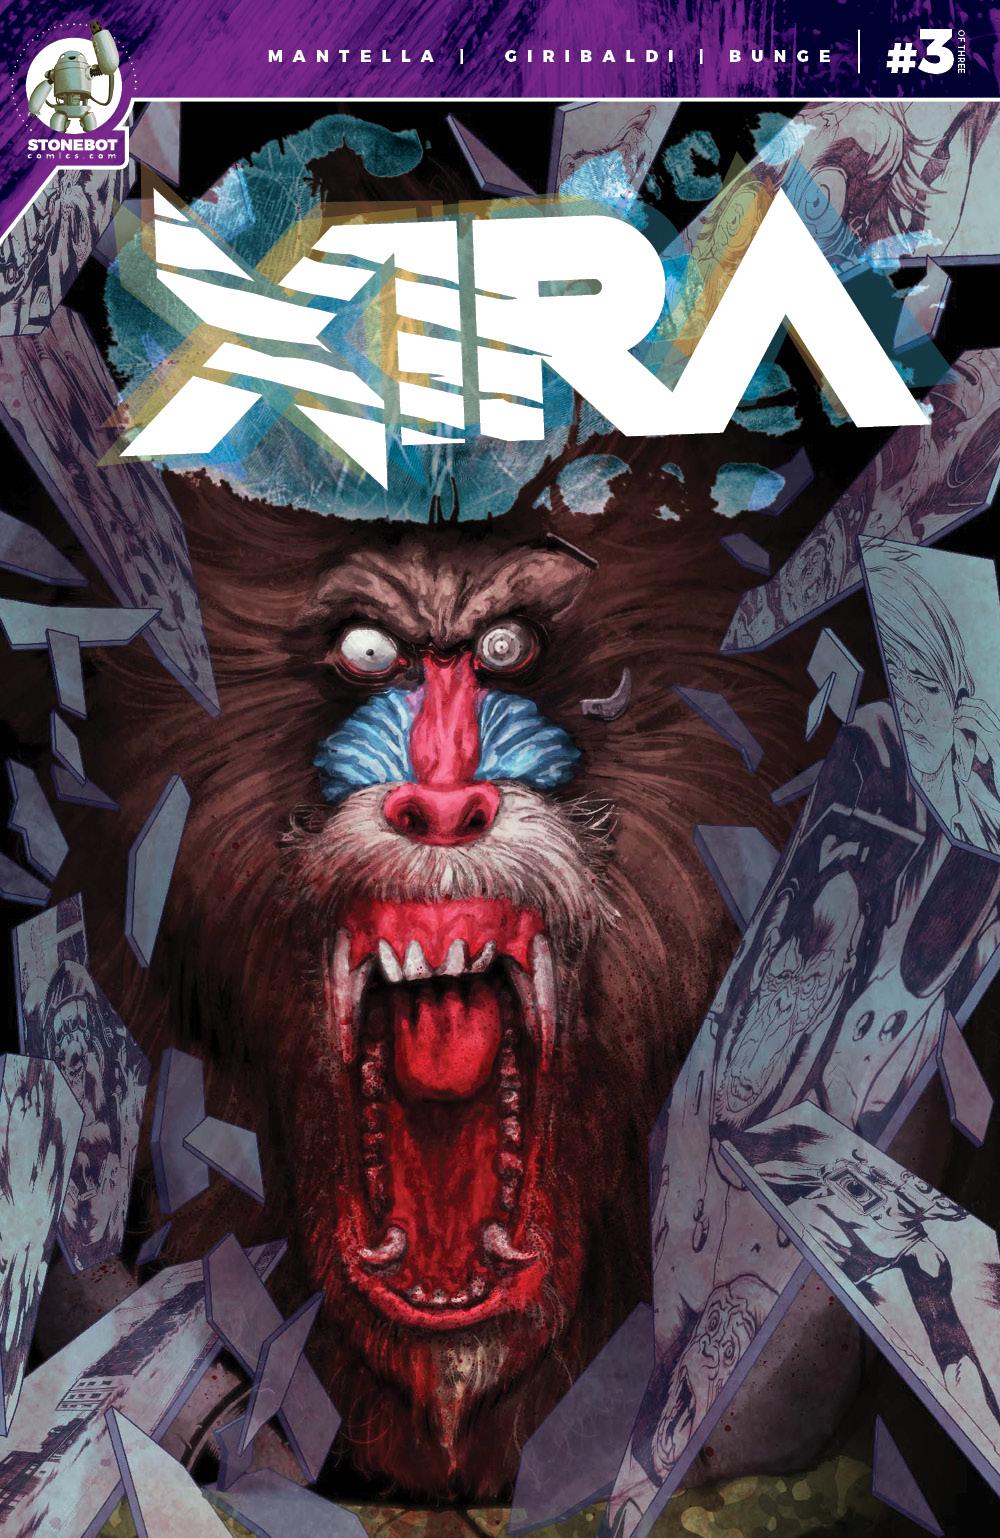 XIRA Chapter #3